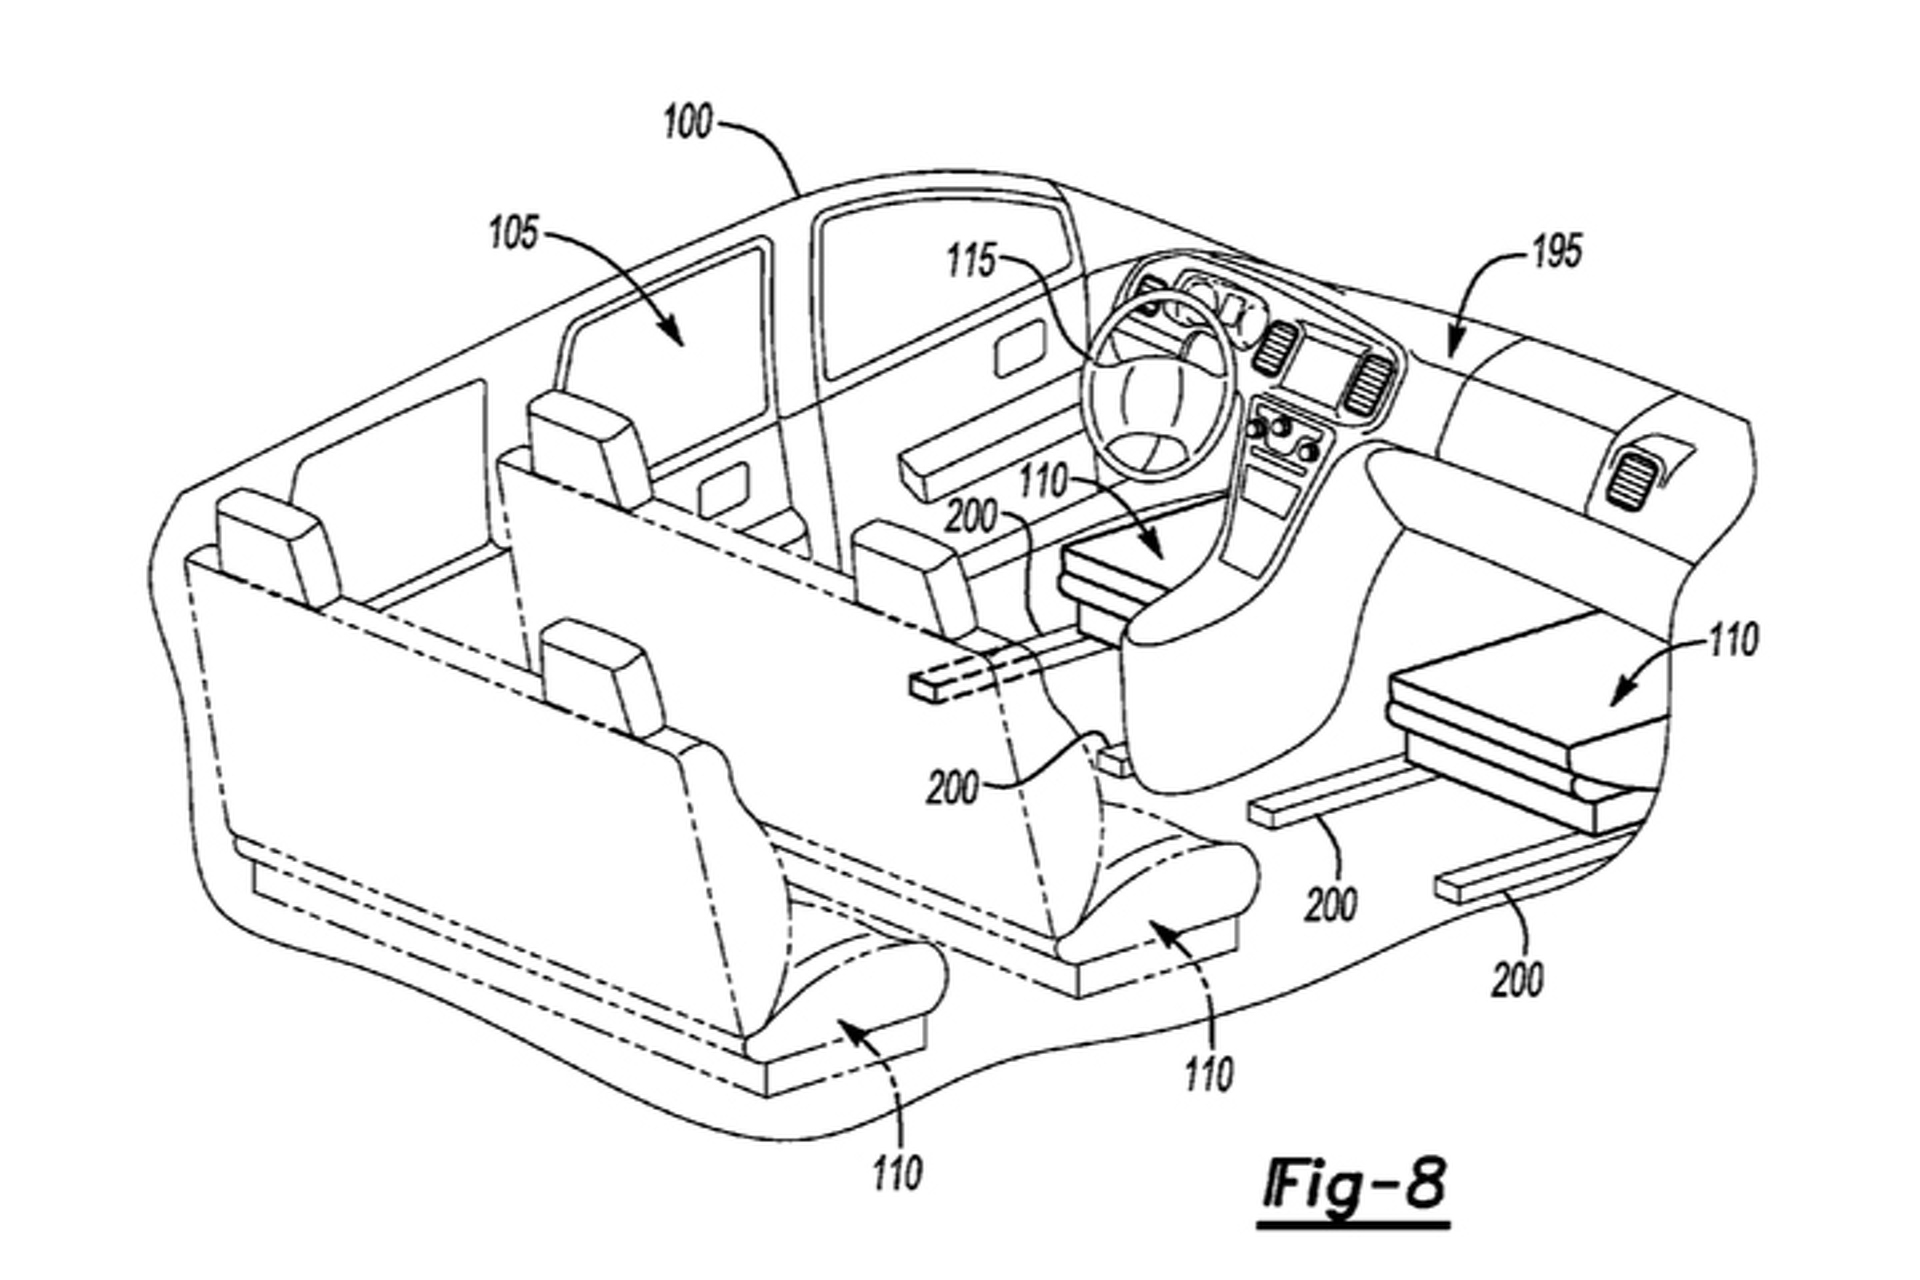 New Ford Patent Reveals Shape Shifting Car Interior